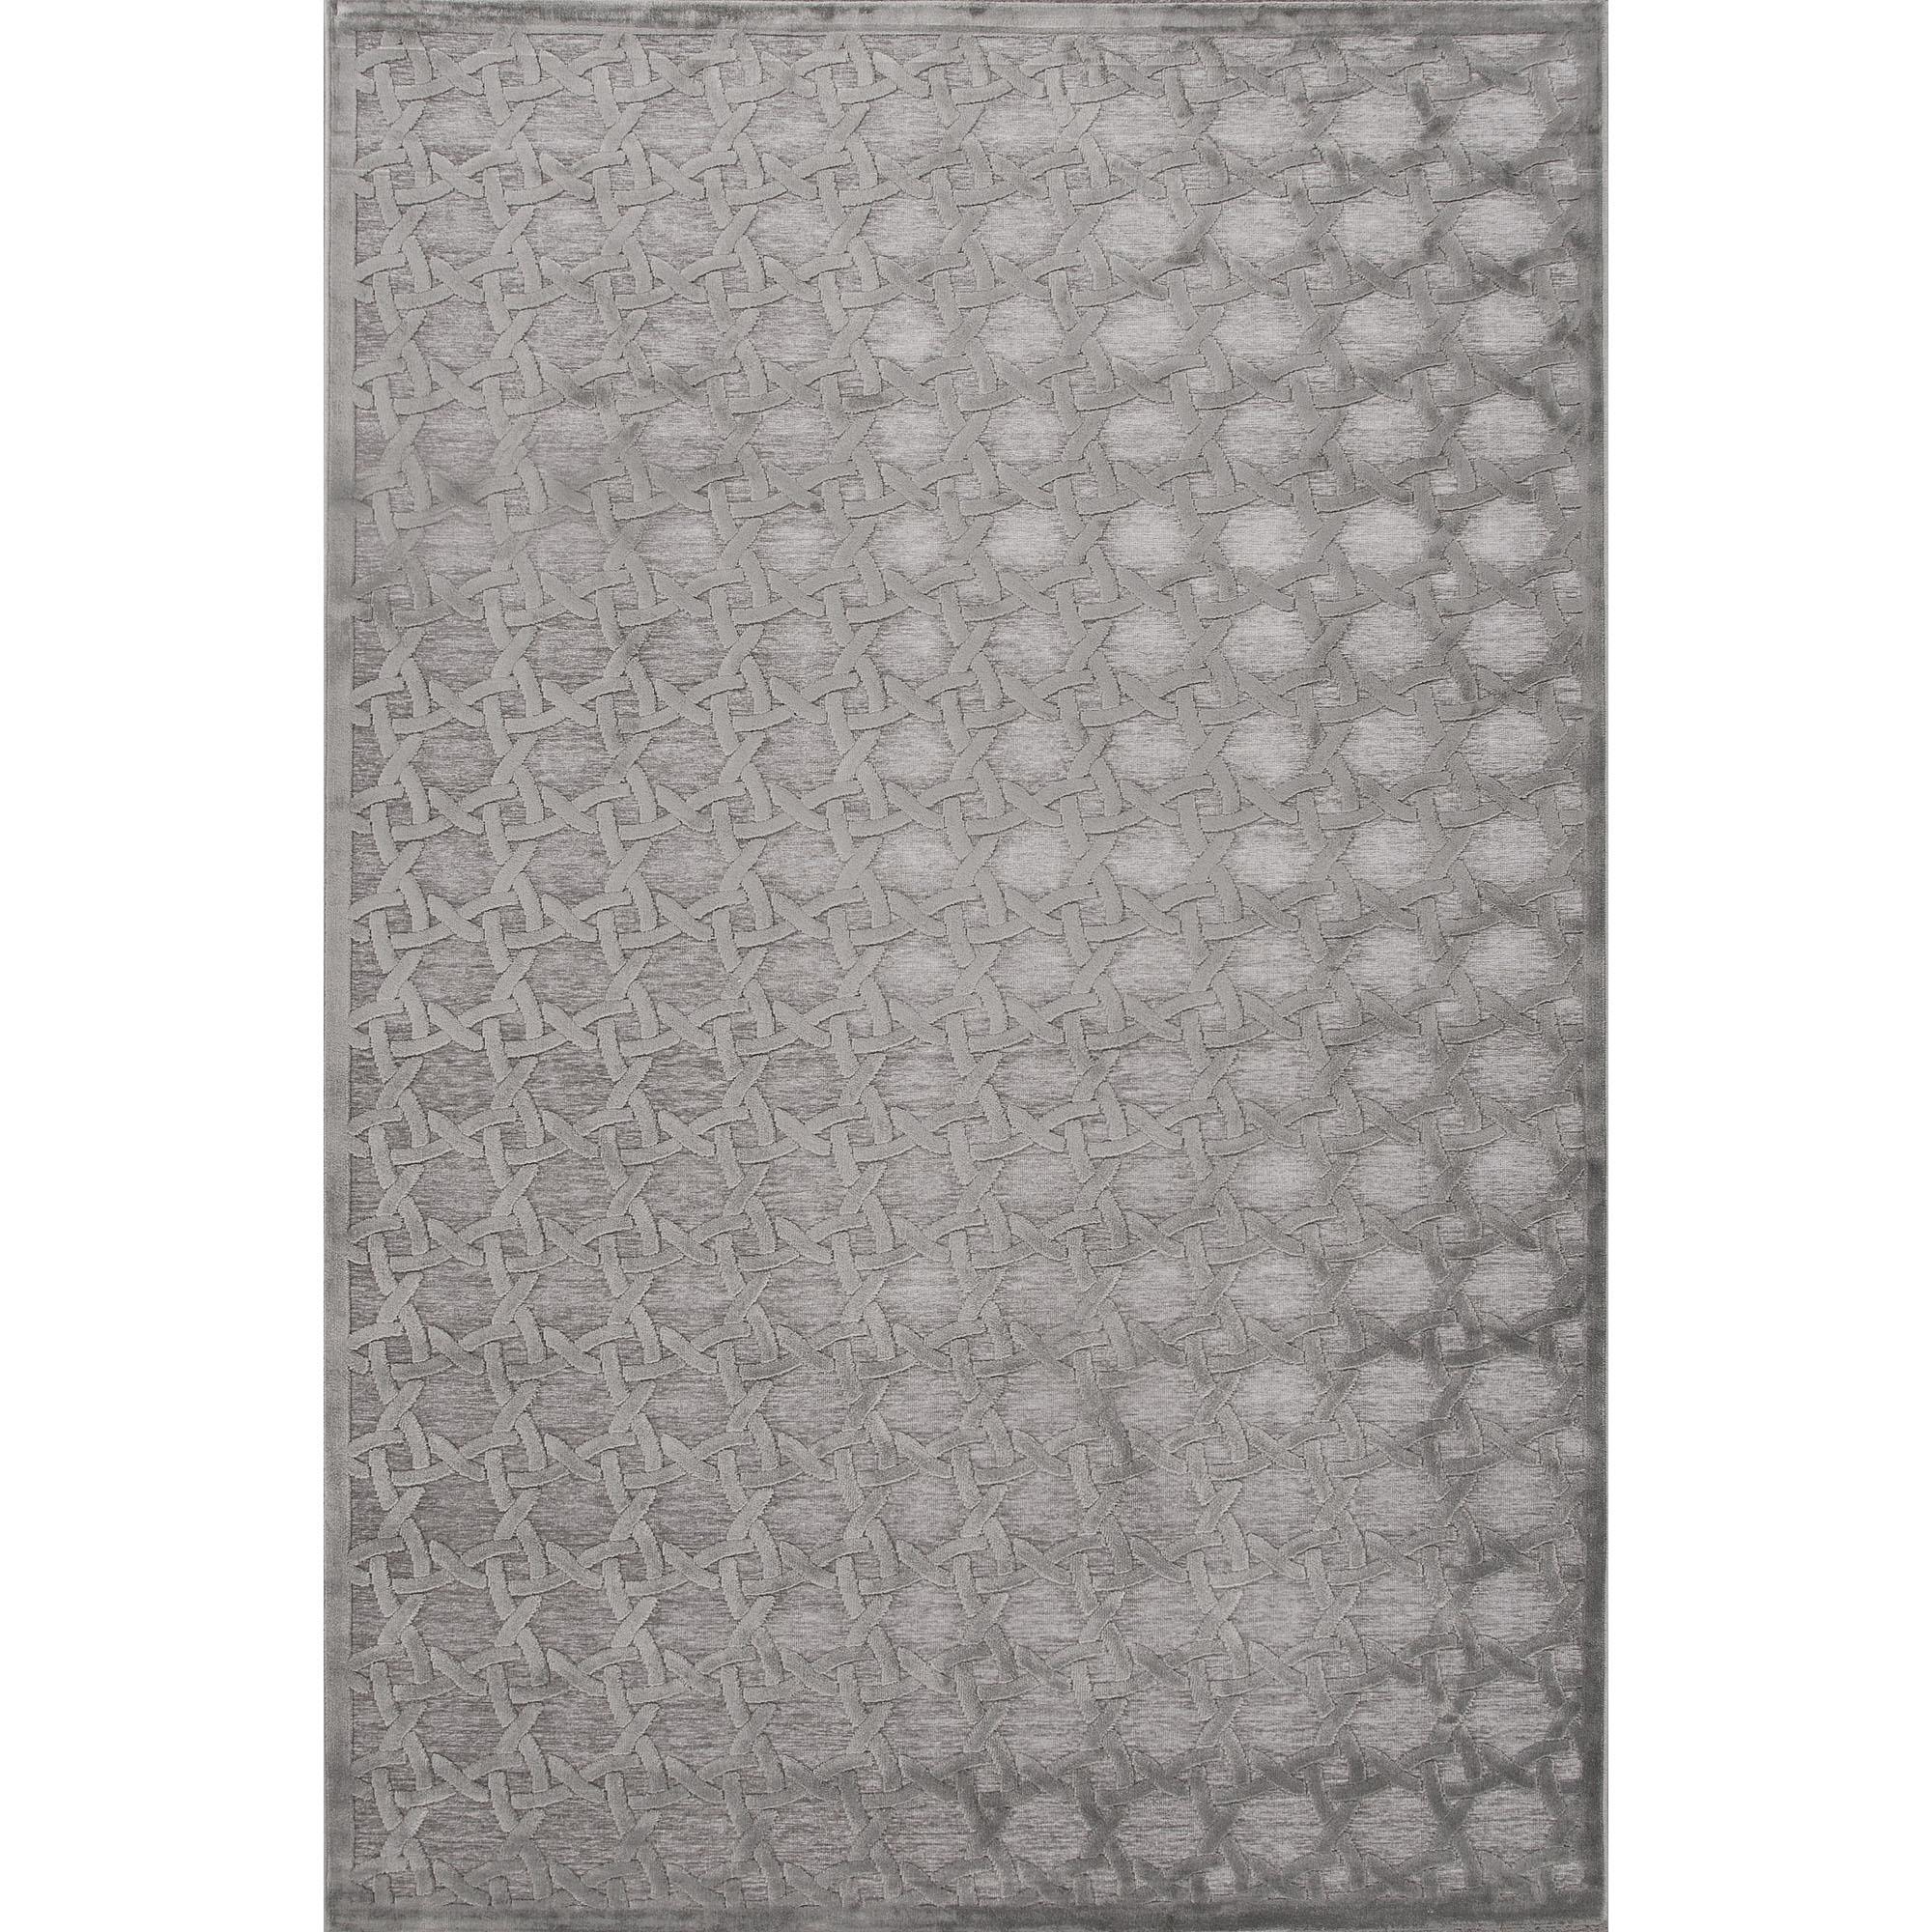 JAIPUR Rugs Fables 5 x 7.6 Rug - Item Number: RUG108693